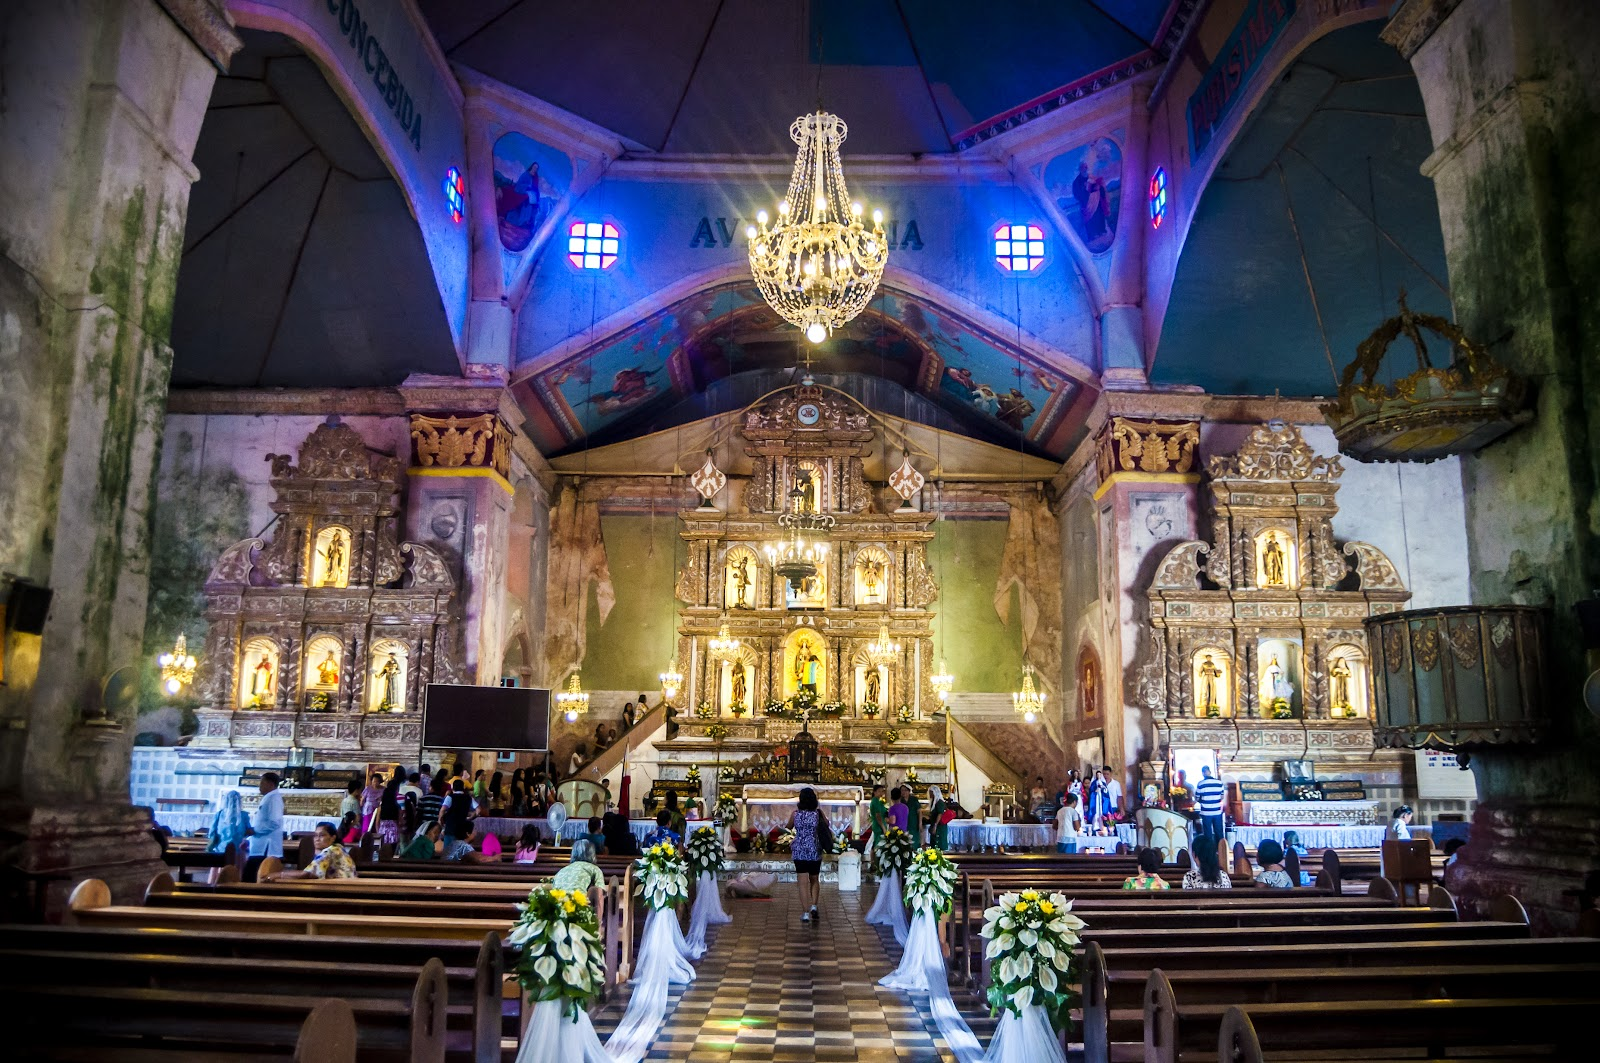 Baclayon Church - Wikipedia